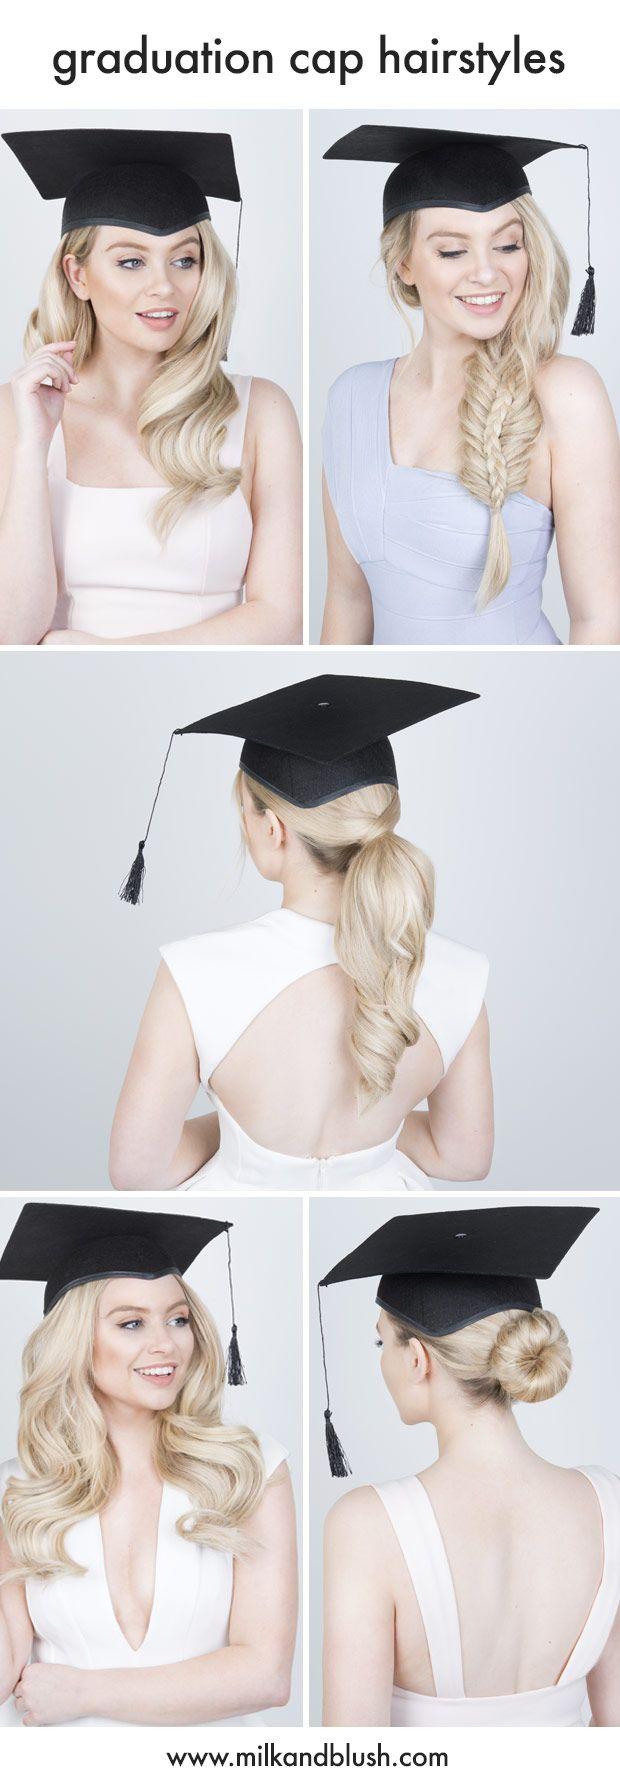 Milk Blush Remy Human Hair Extensions Graduation Hairstyles With Cap Graduation Hairstyles Hair Styles